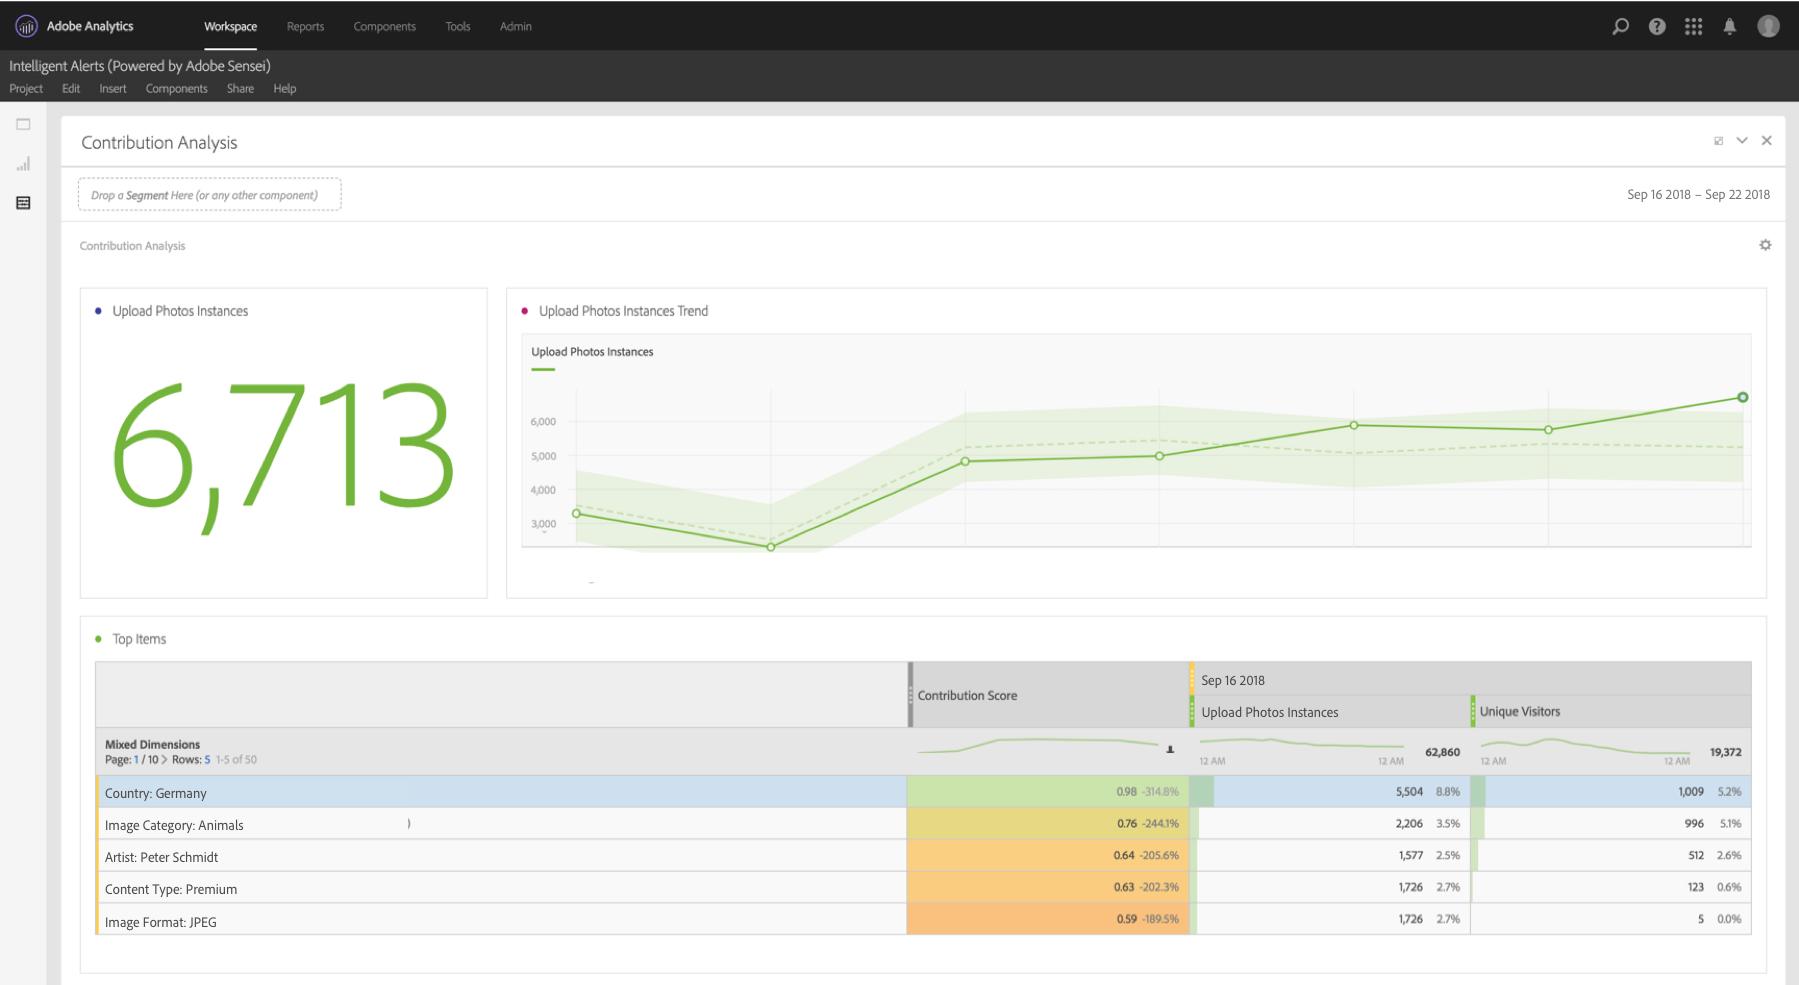 Adobe Analytics contribution analysis